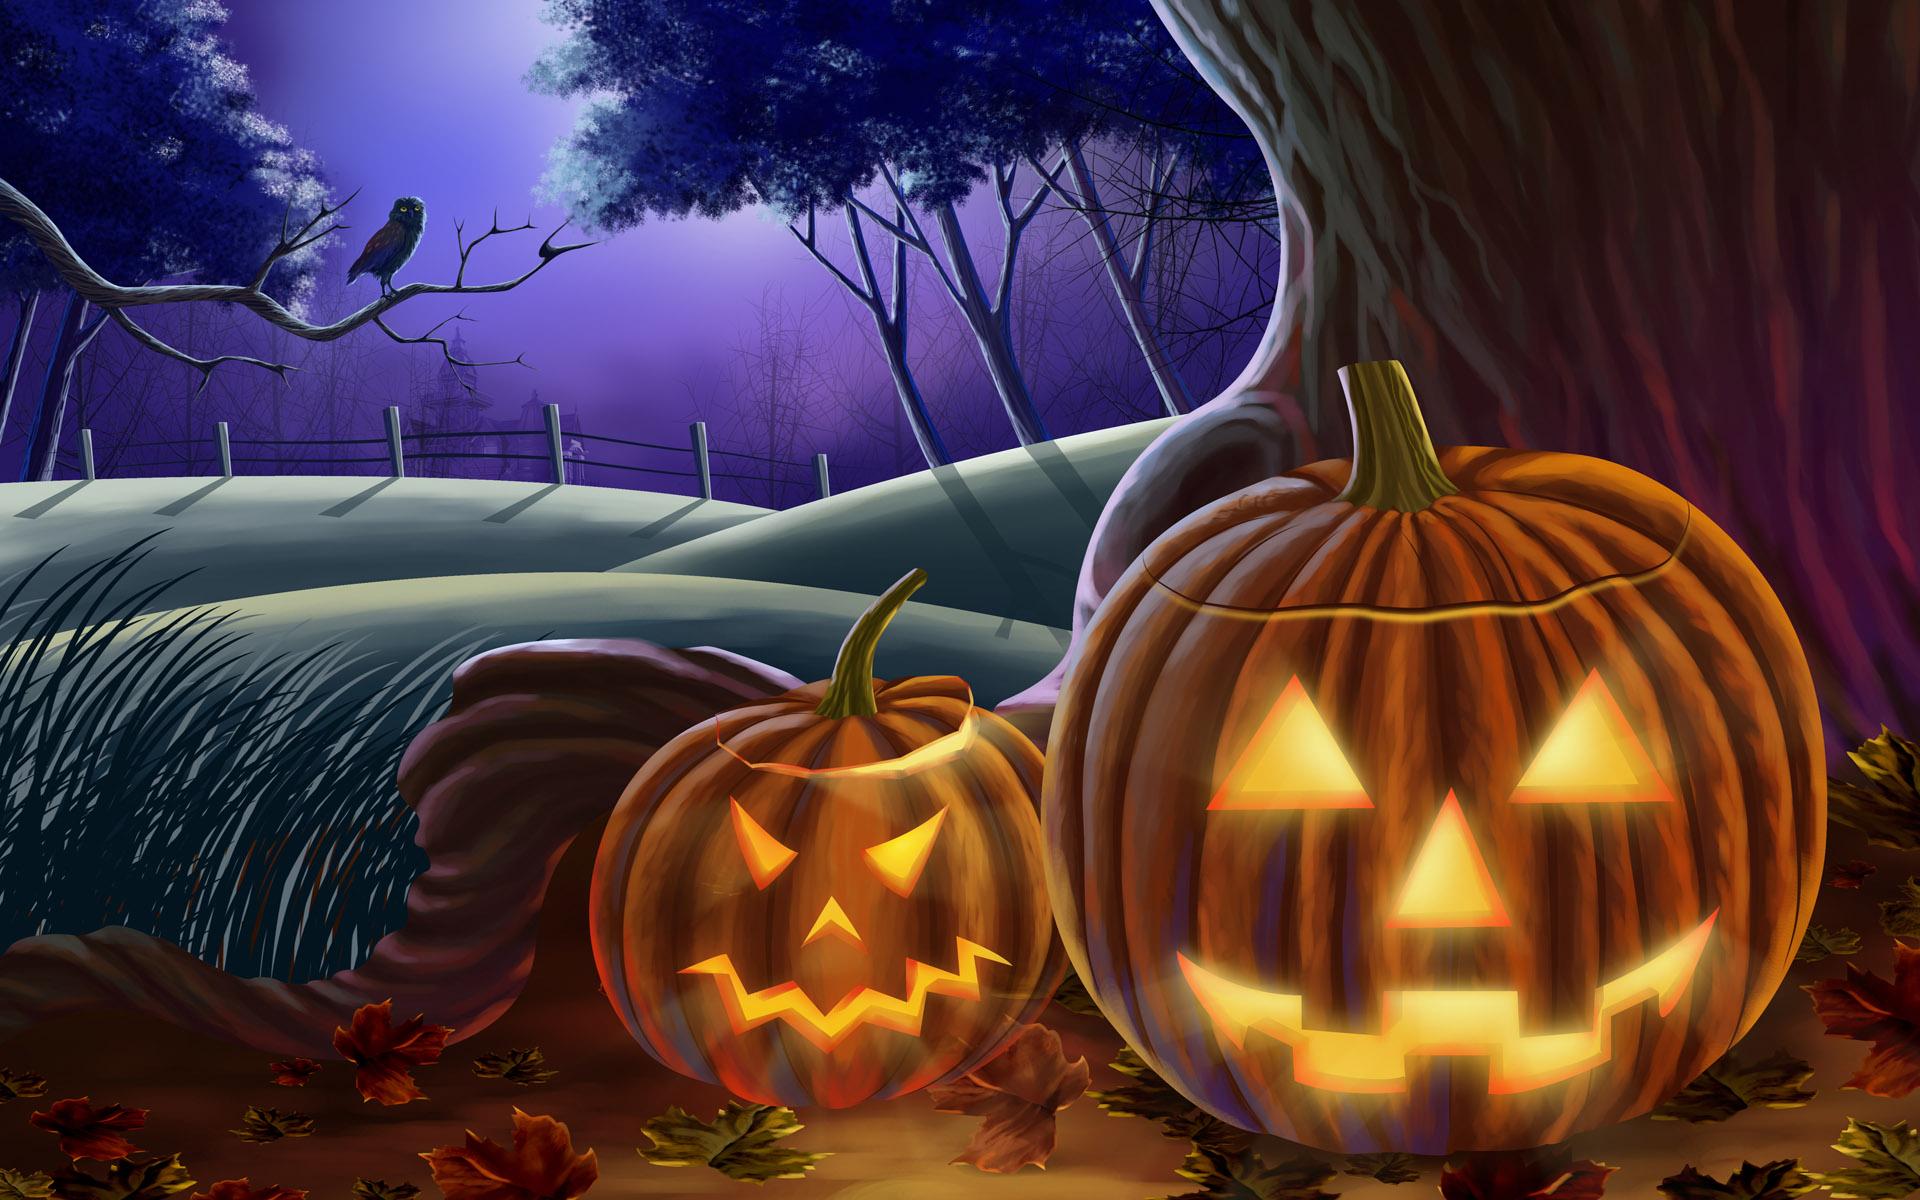 Halloween Widescreen Crazy Pumpkins Wallpapers X